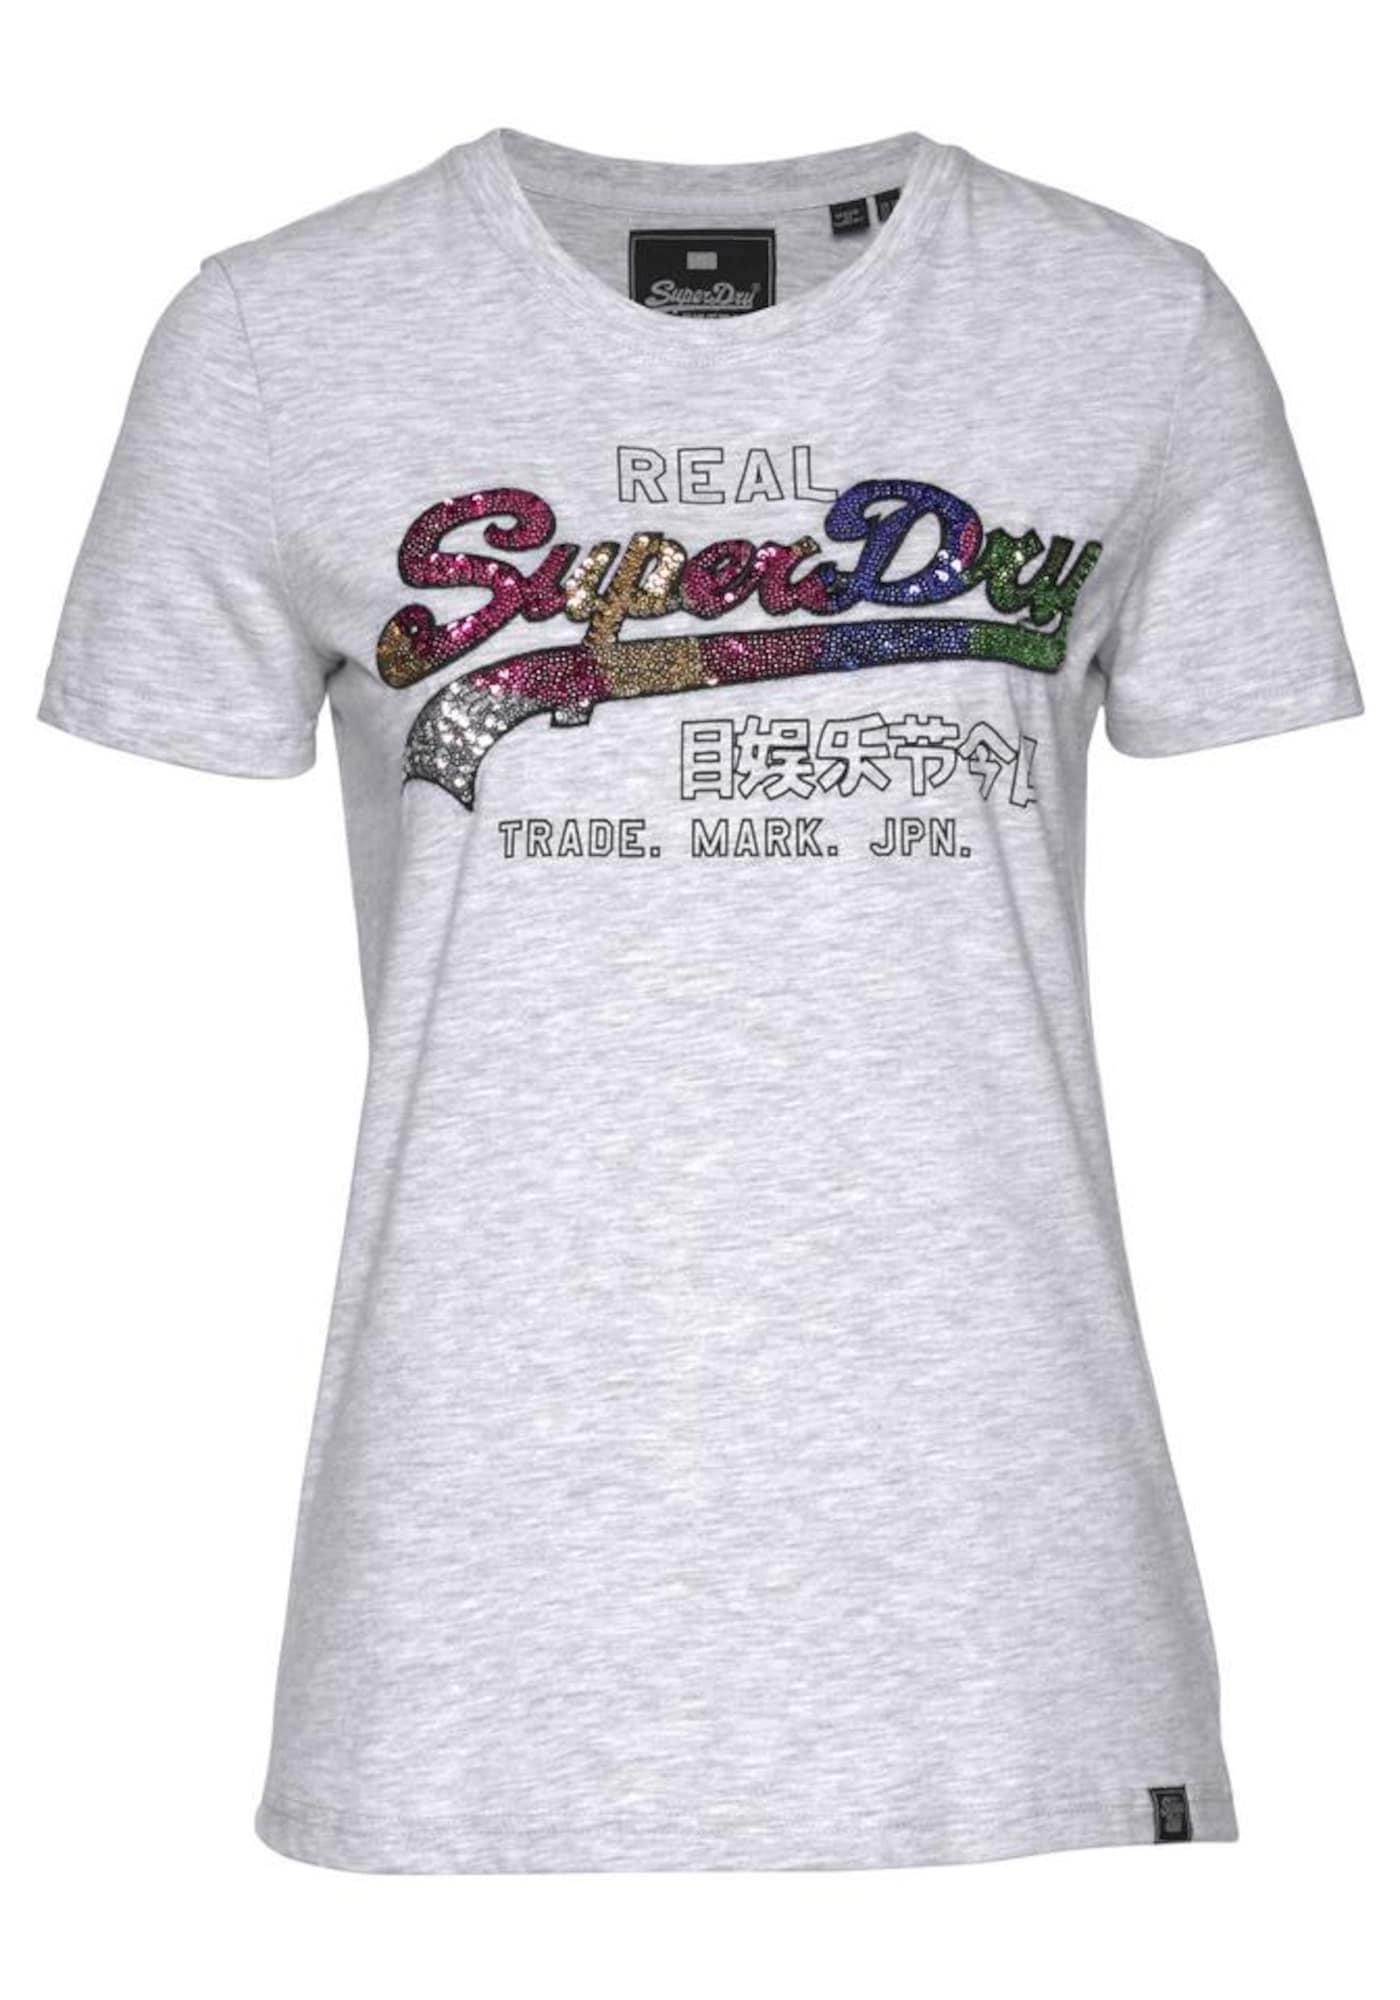 Tričko Carnival Sequin Entry šedý melír mix barev Superdry